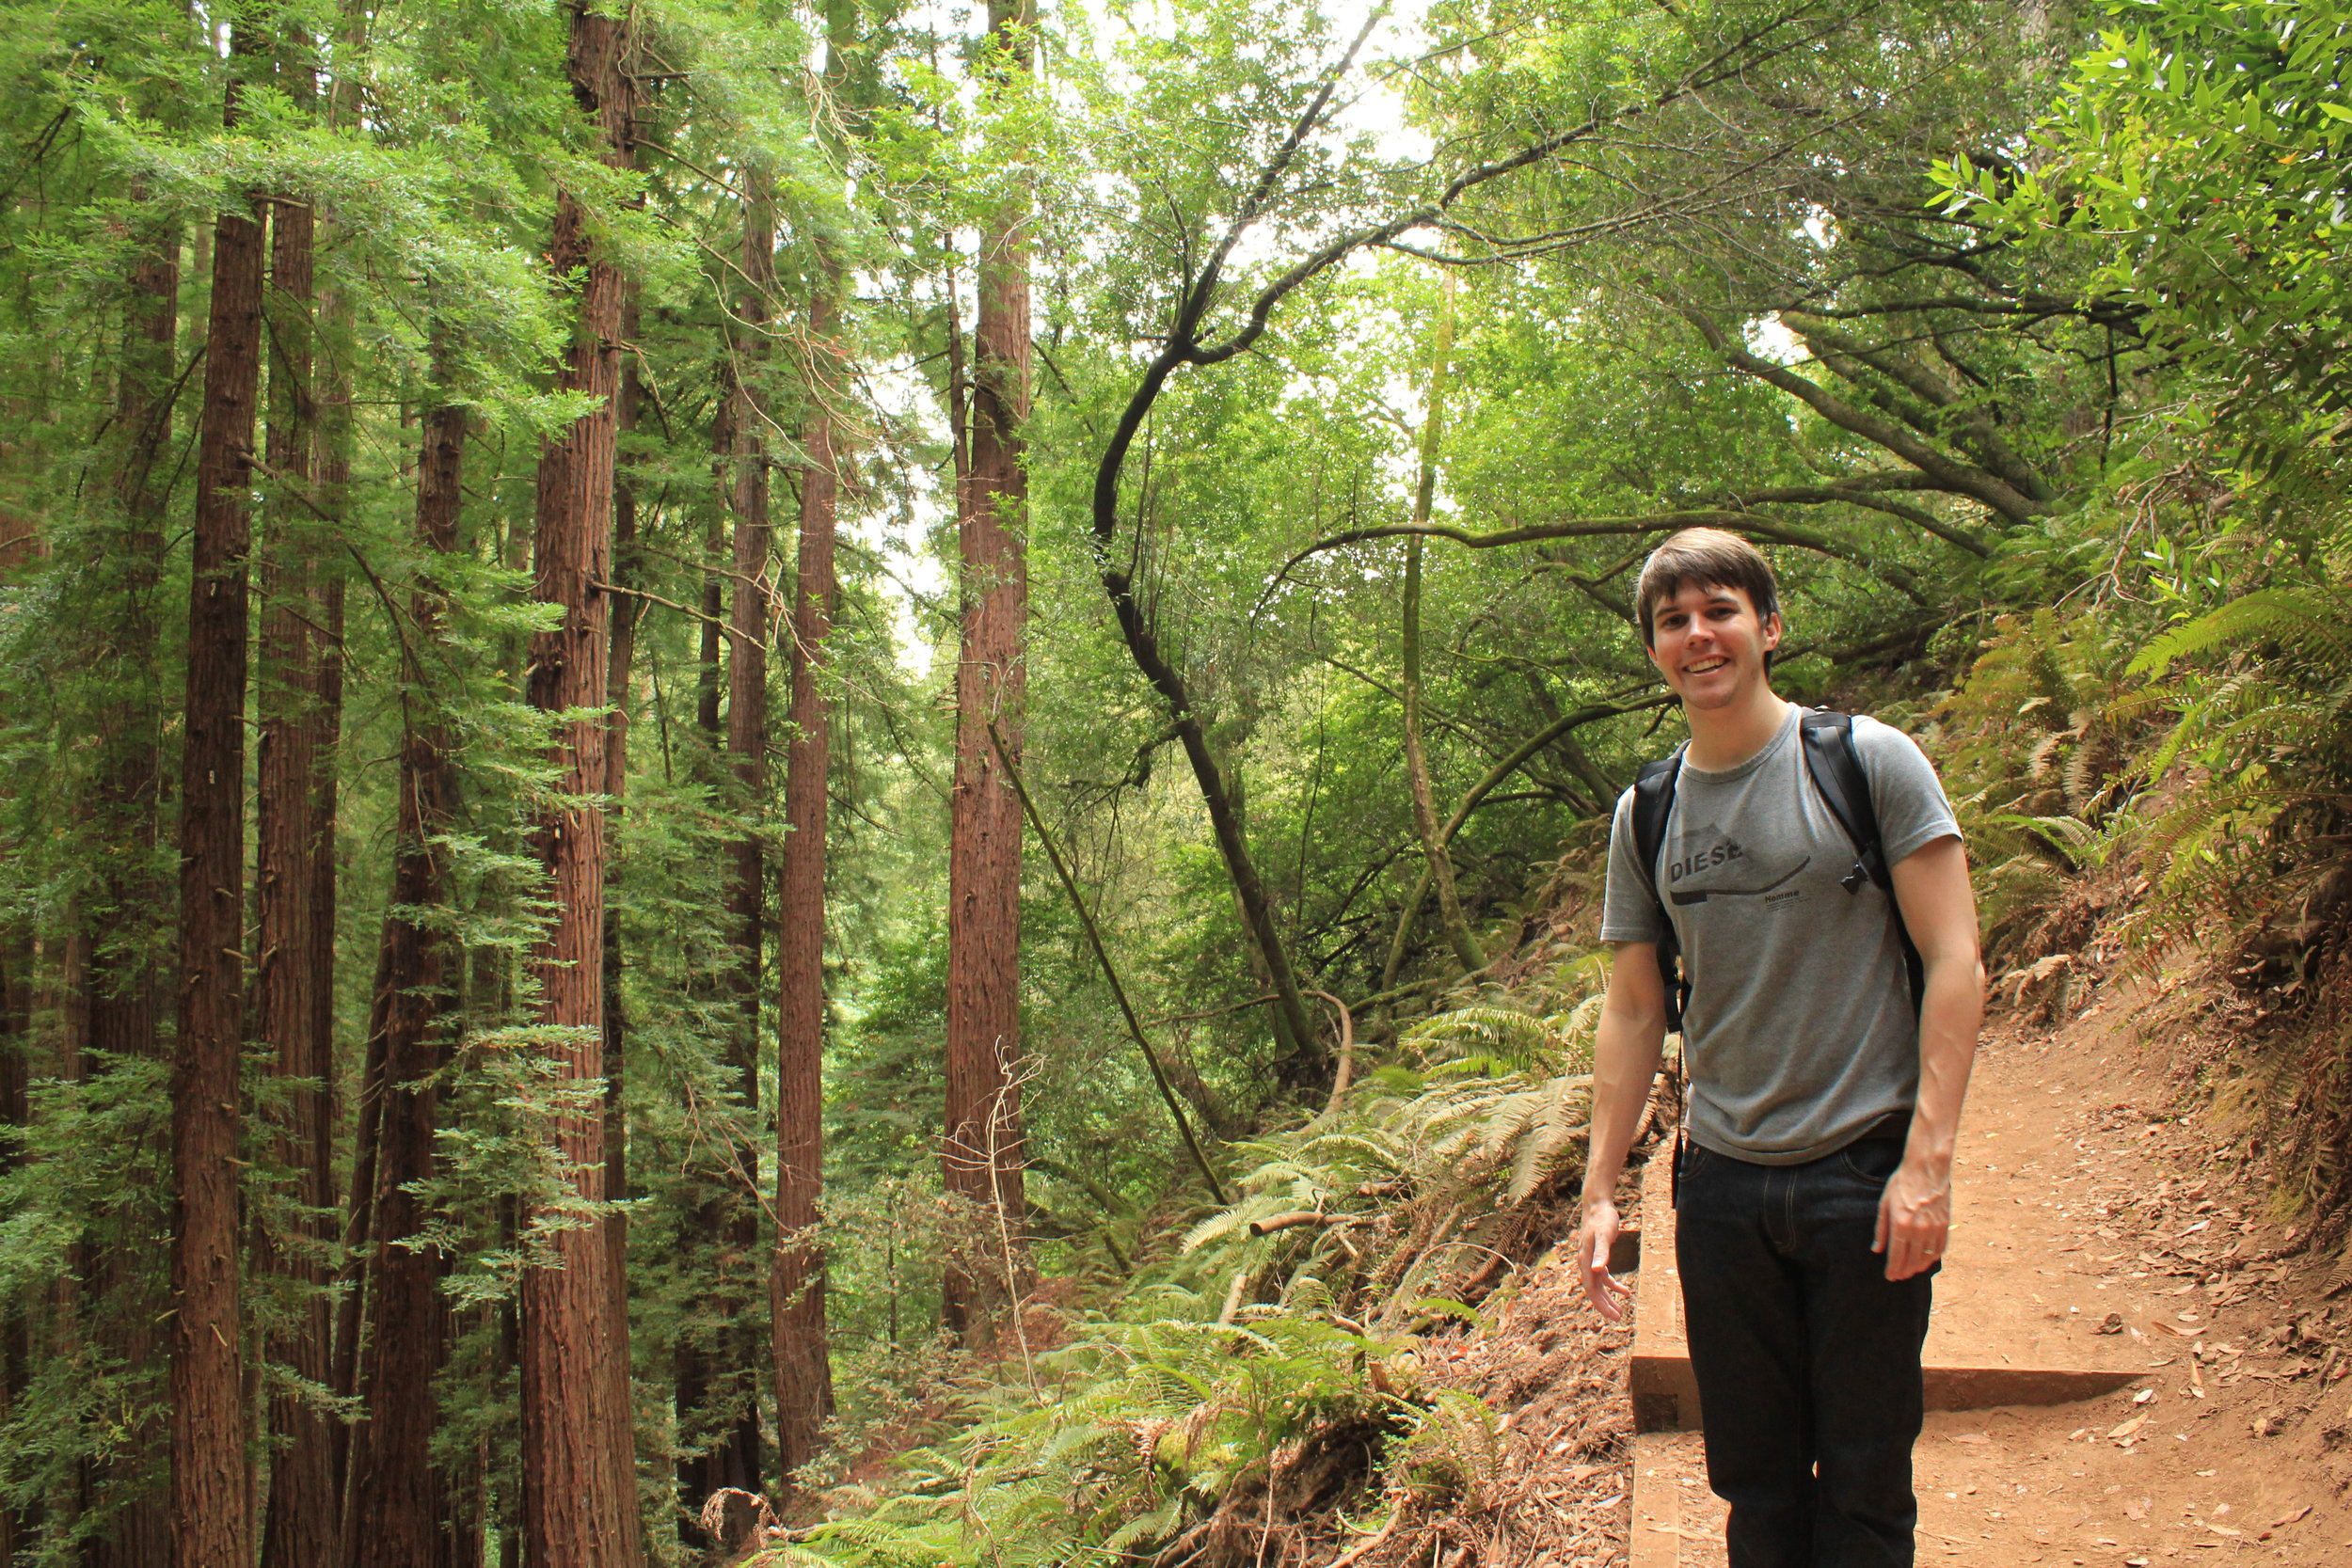 The Beautiful Muir Woods